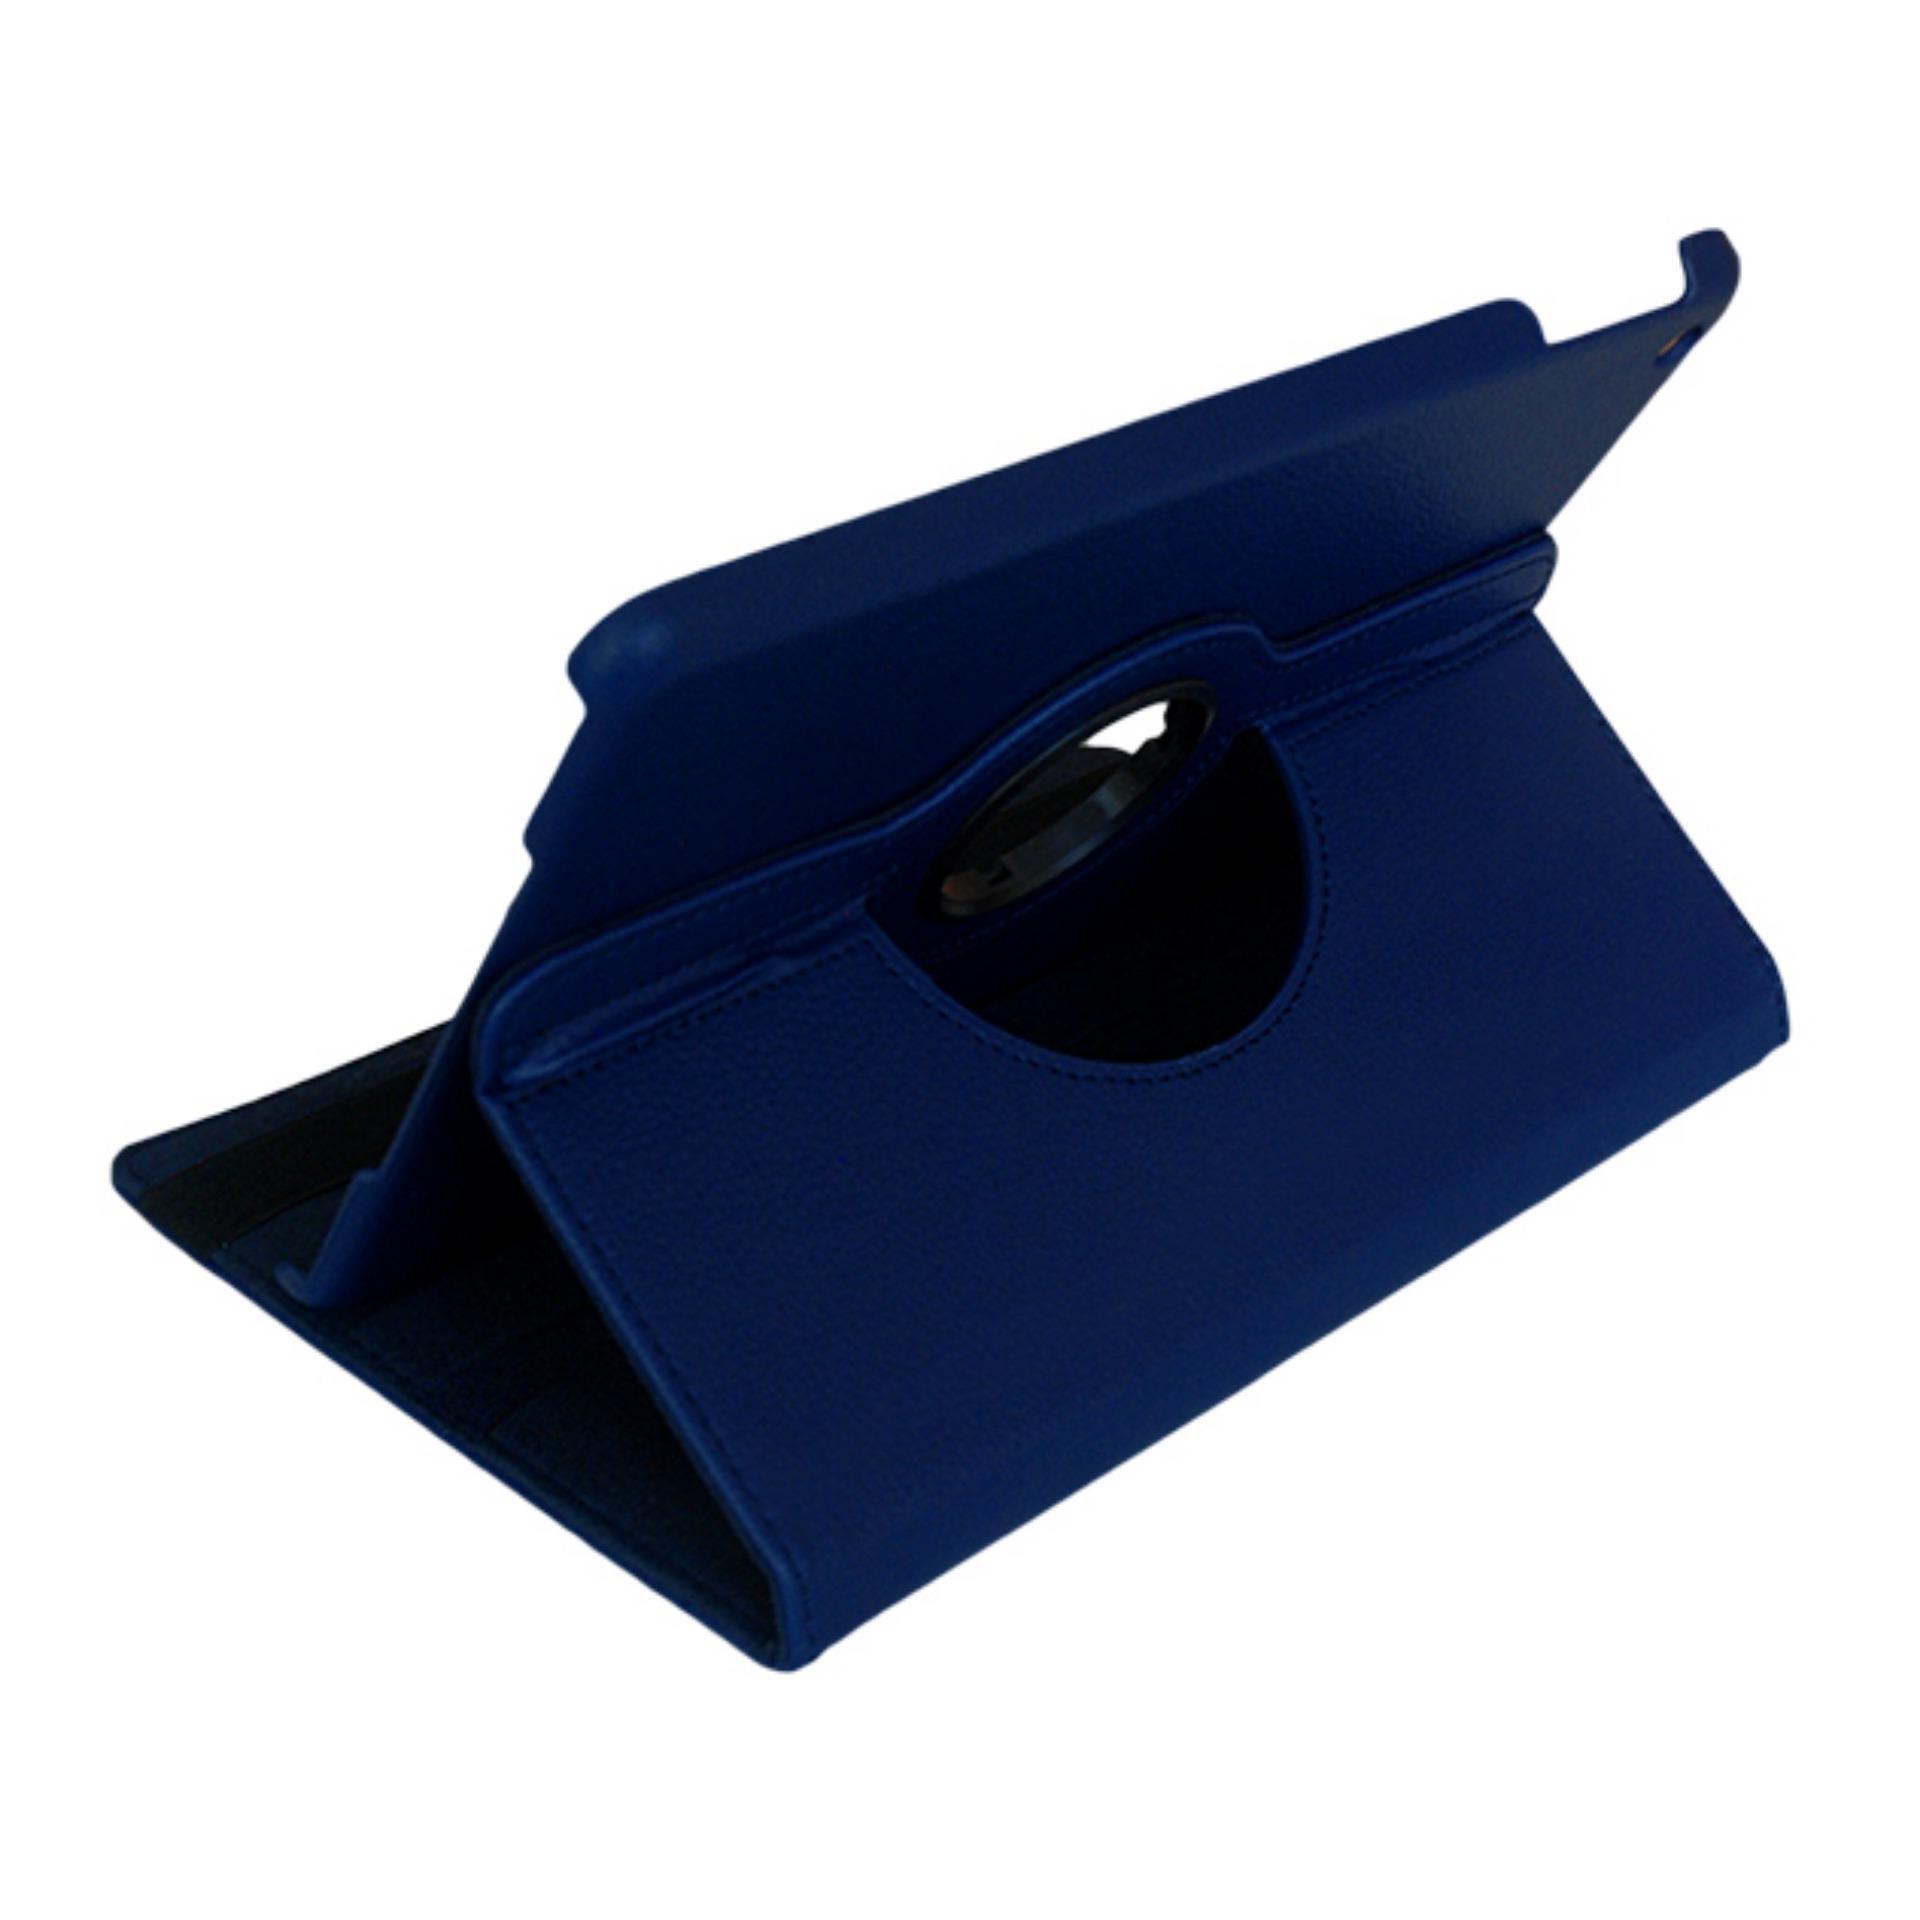 Bao da dành cho iPad 2 3 4 Xoay 360 - Lopez Cute (Xanh đen) + Tặng miếng dán bảo...